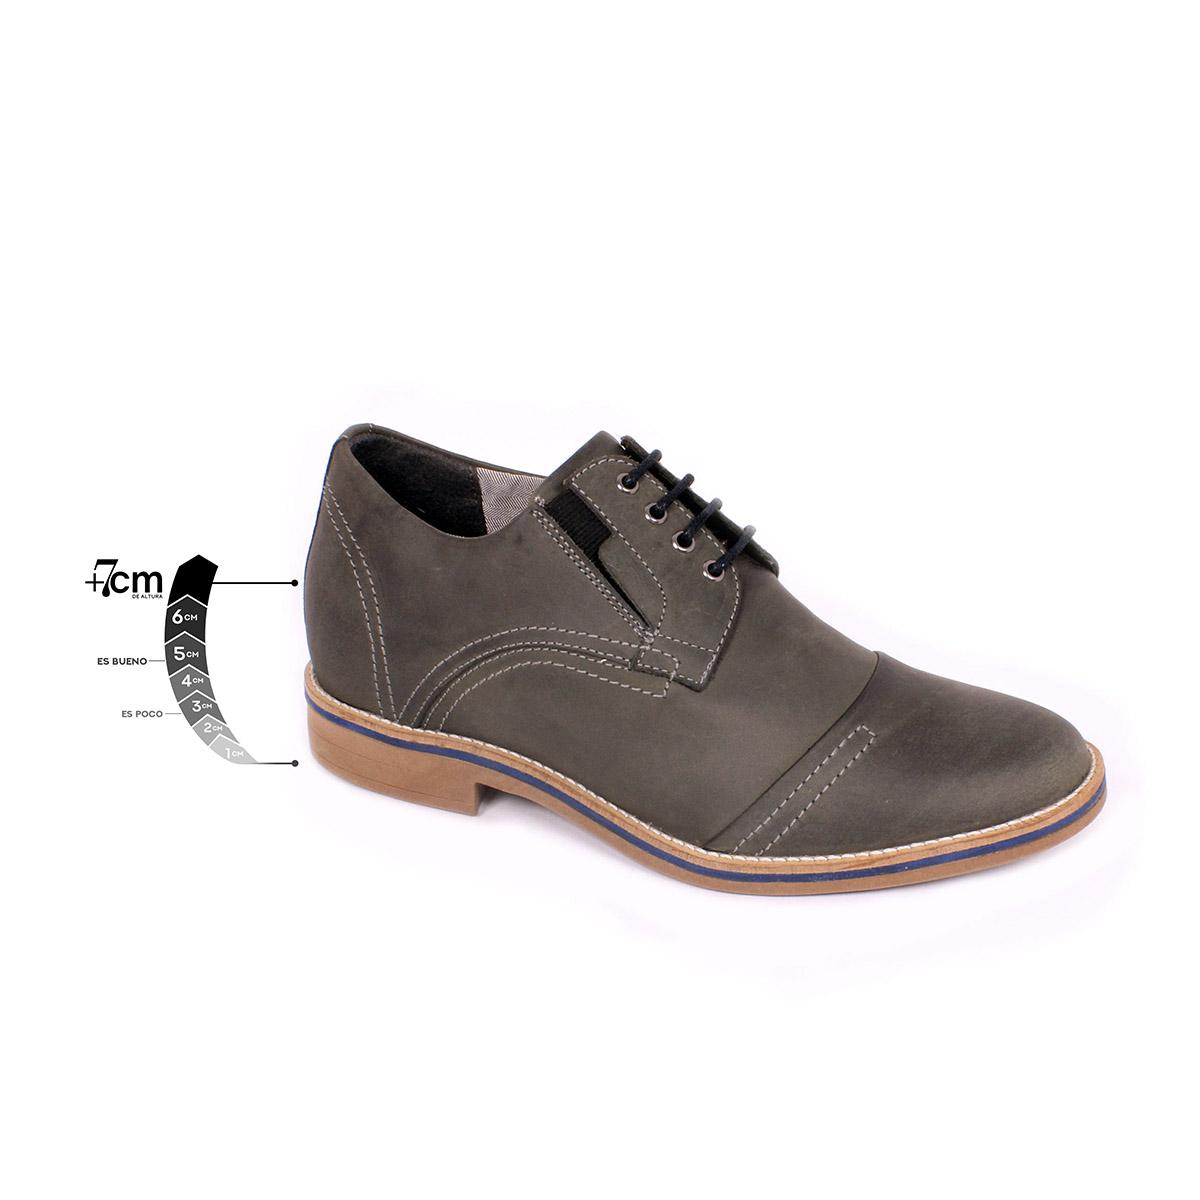 Zapato Casual Trend Gris Petroleo Max Denegri +7cms de Altura_75297